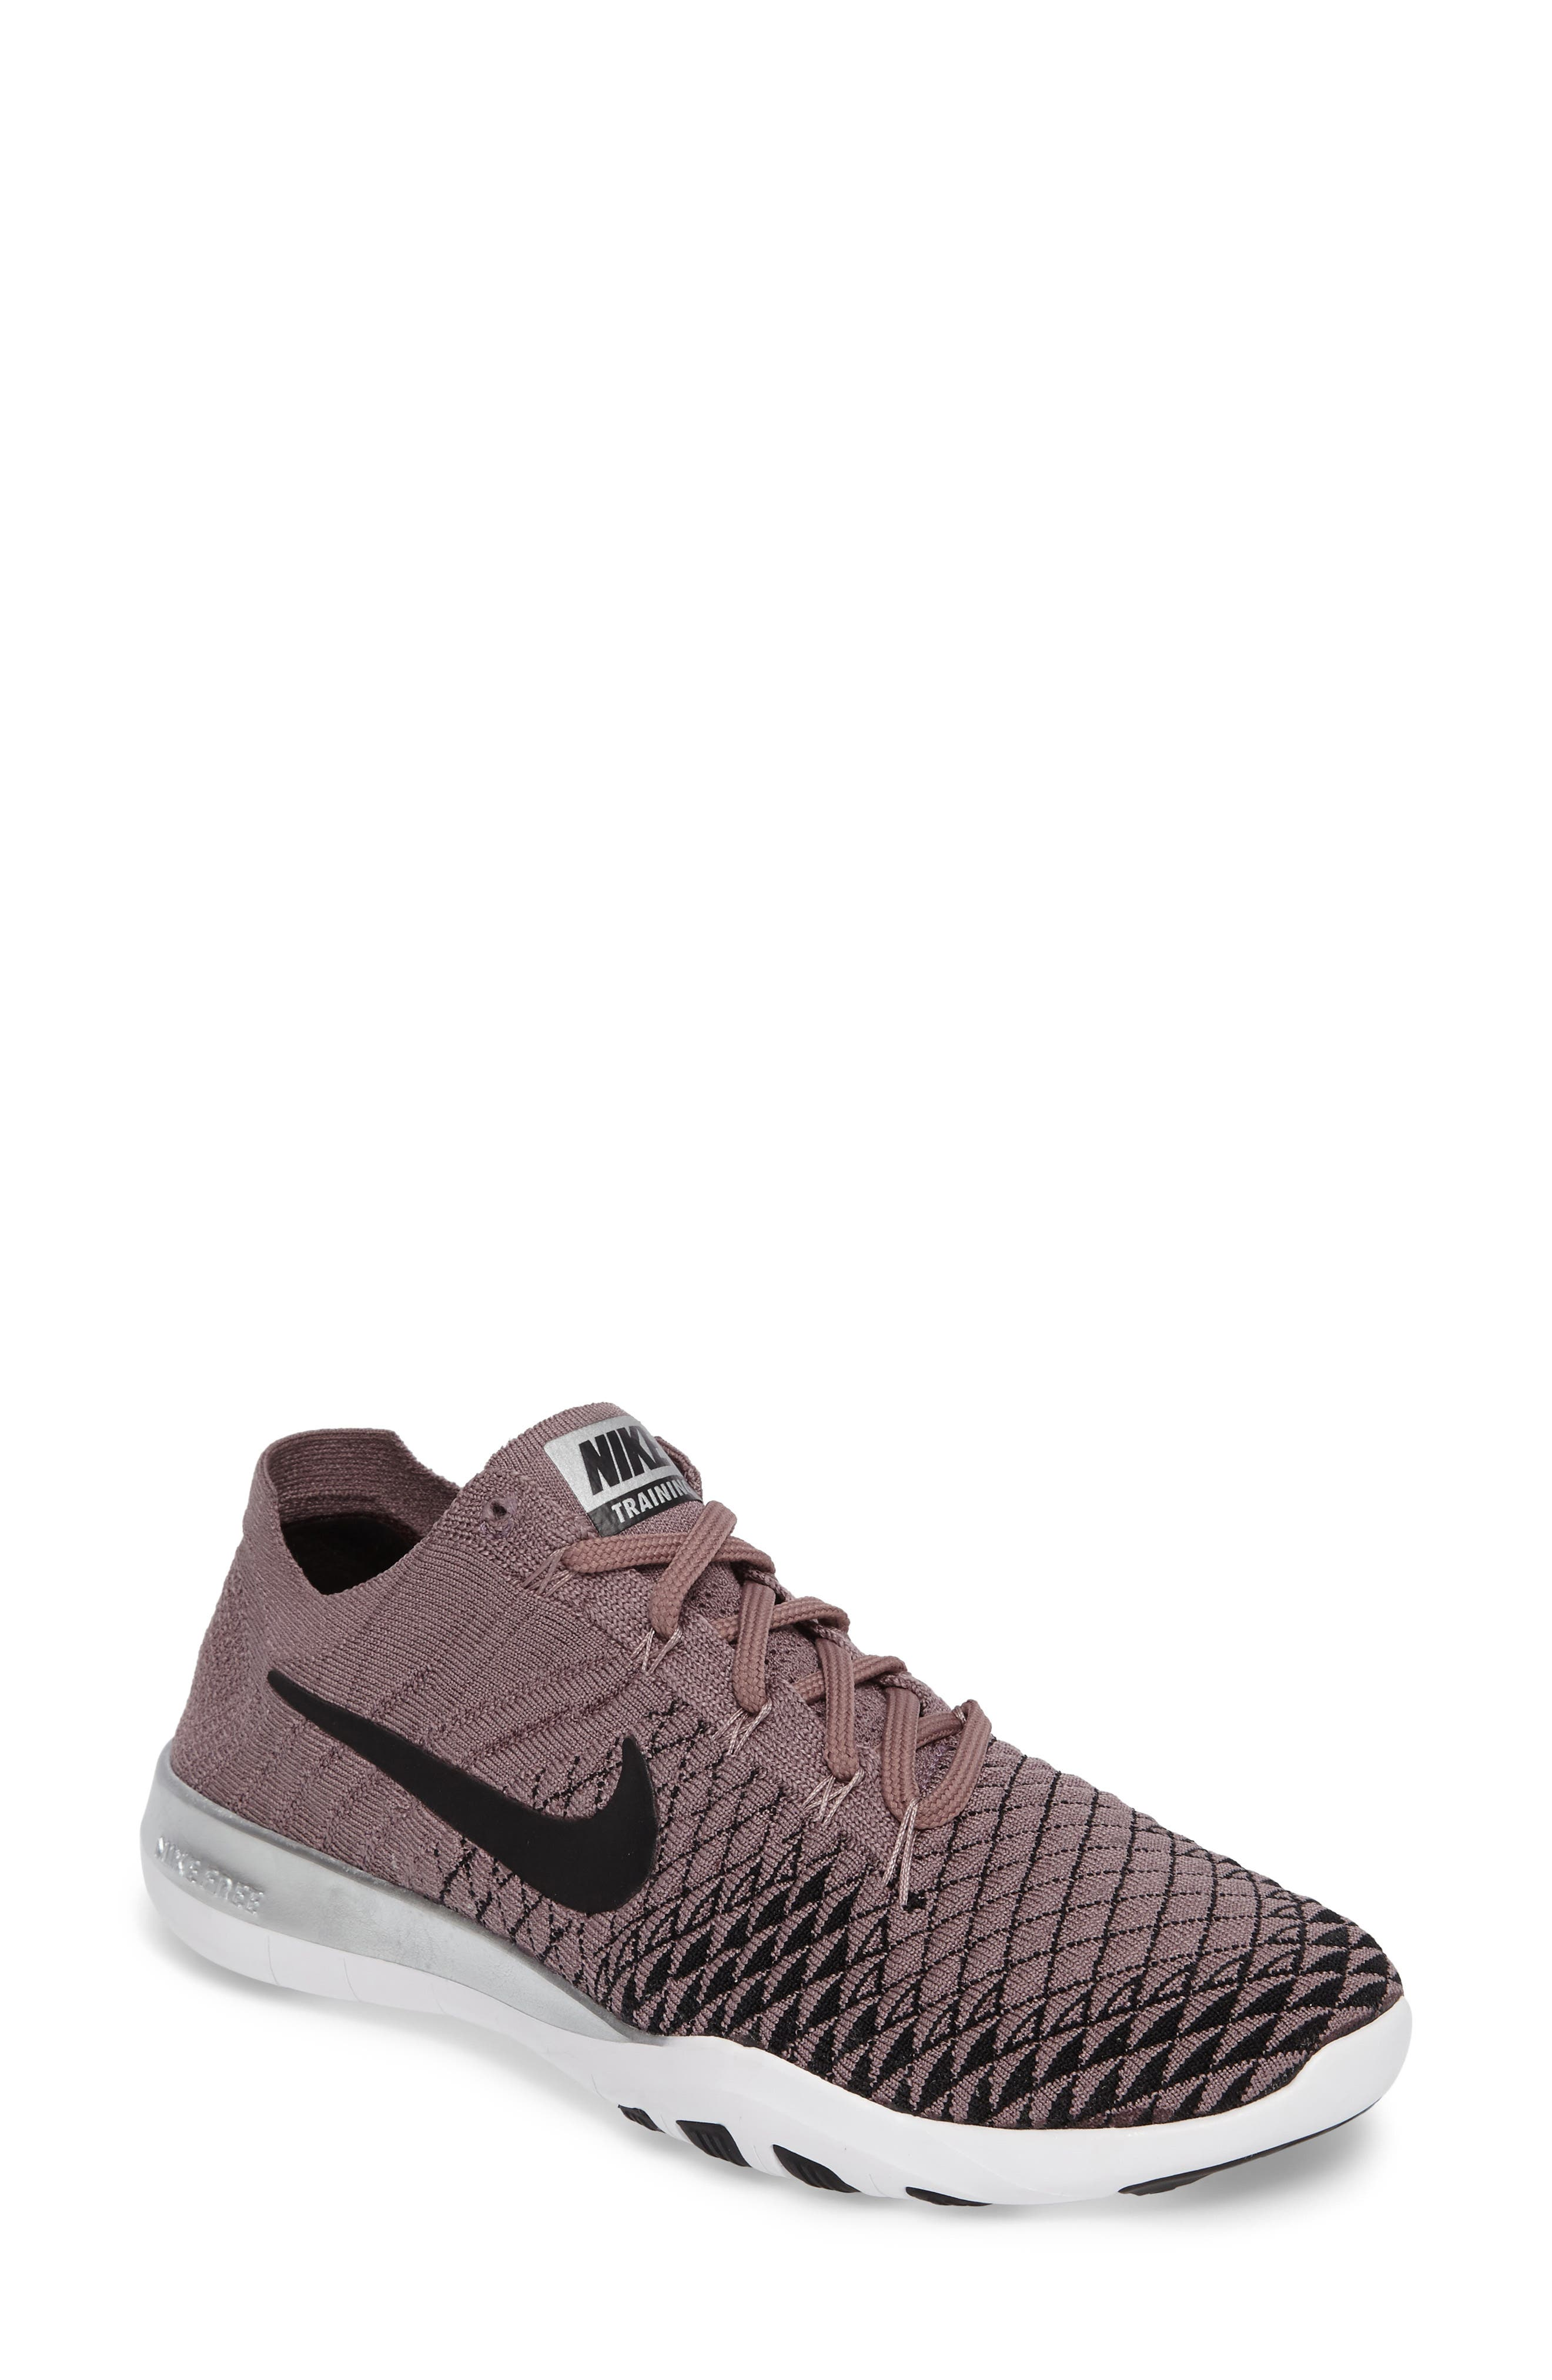 Alternate Image 1 Selected - Nike Free Focus Flyknit 2 Bionic Training Shoe (Women)